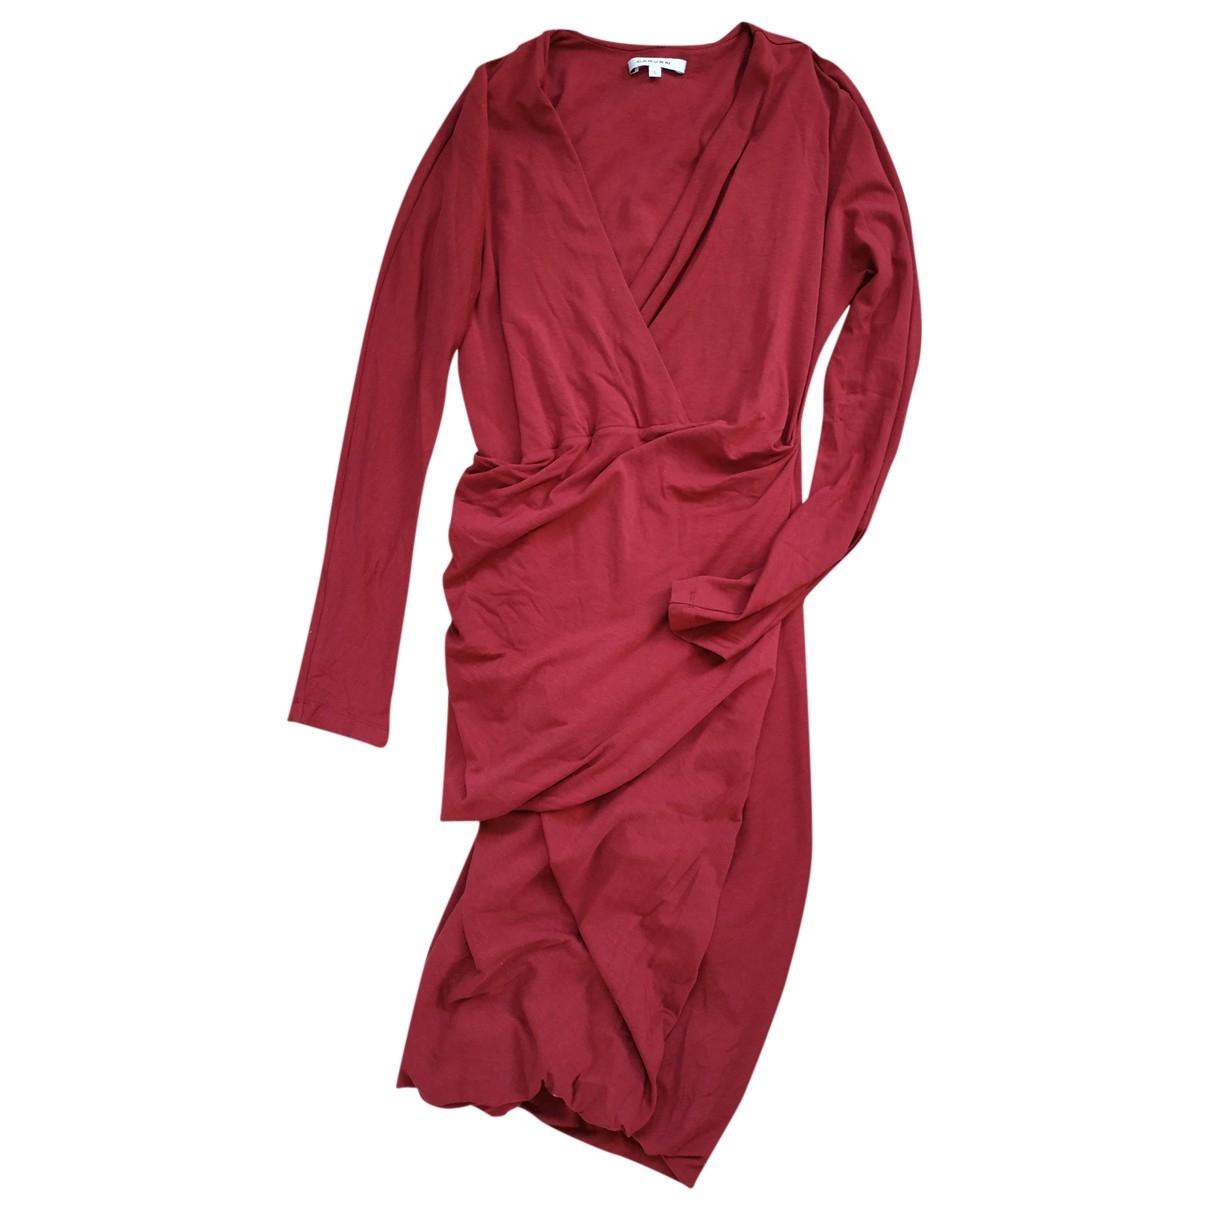 Carven \N Red Cotton - elasthane dress for Women L International